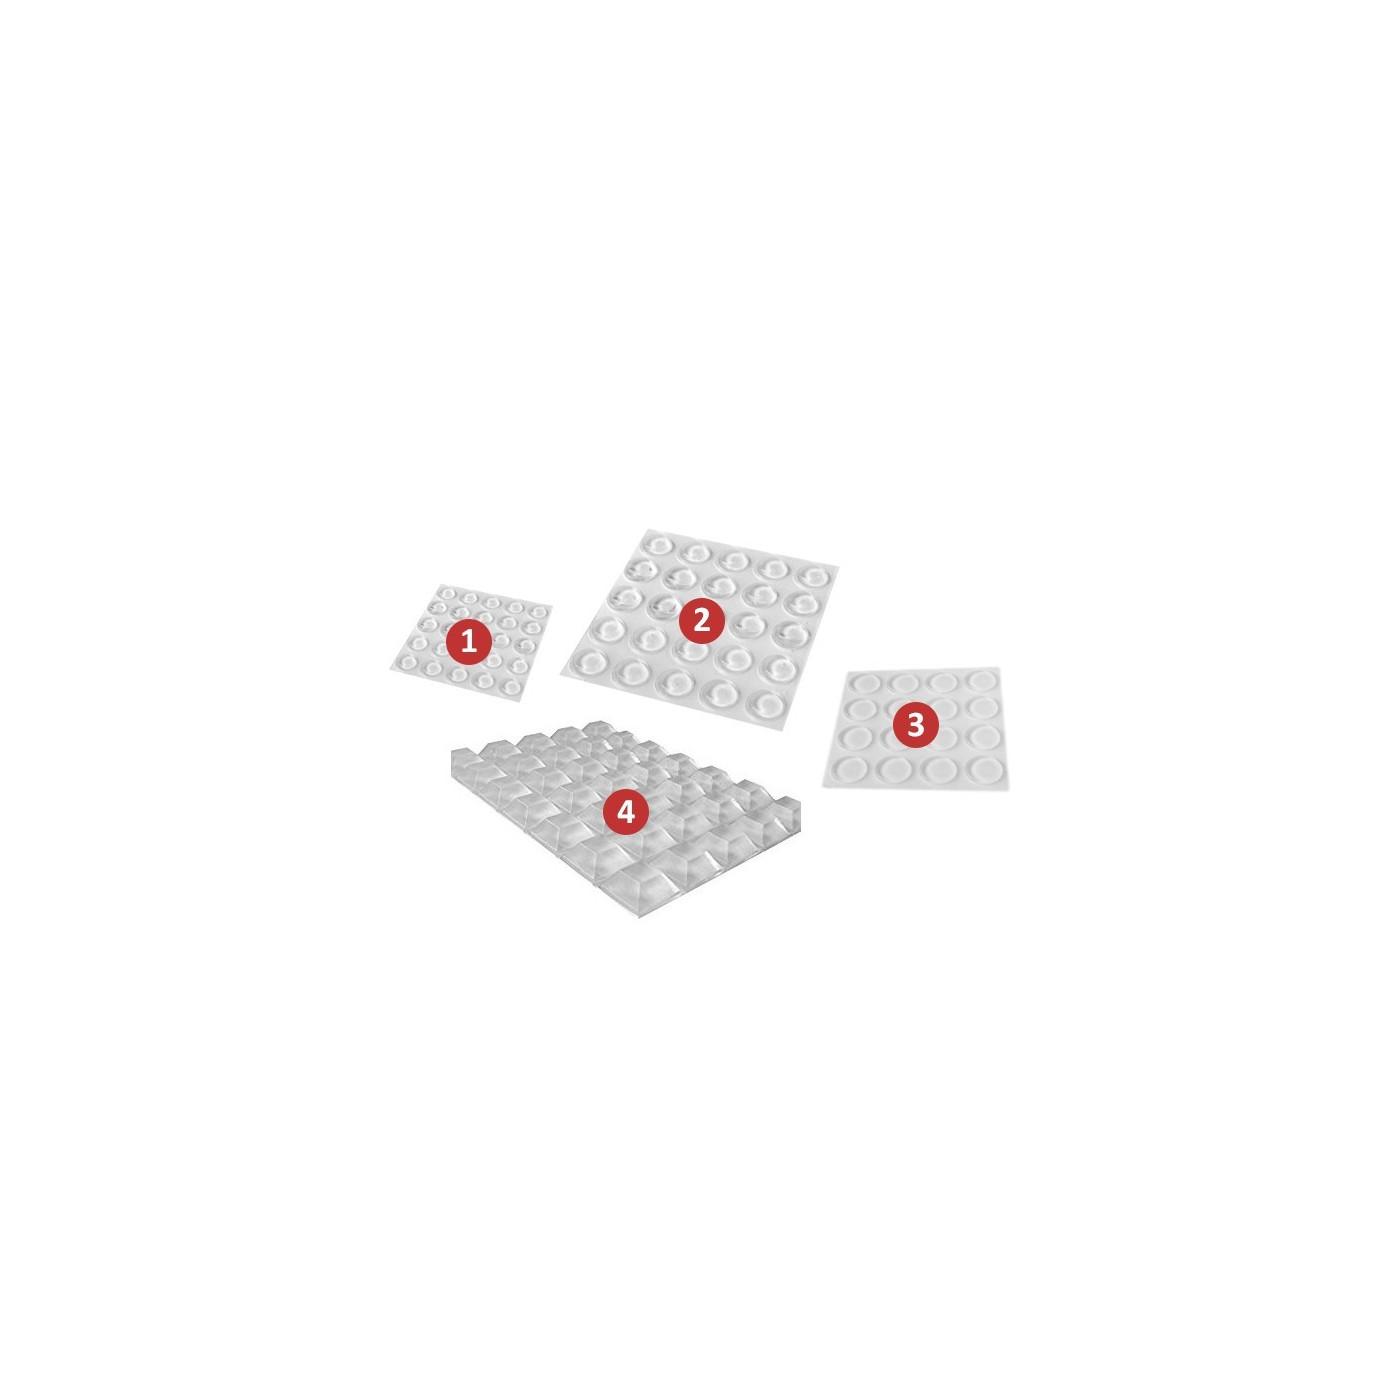 Set of 318 self adhesive buffers (combi-pack: 4 types)